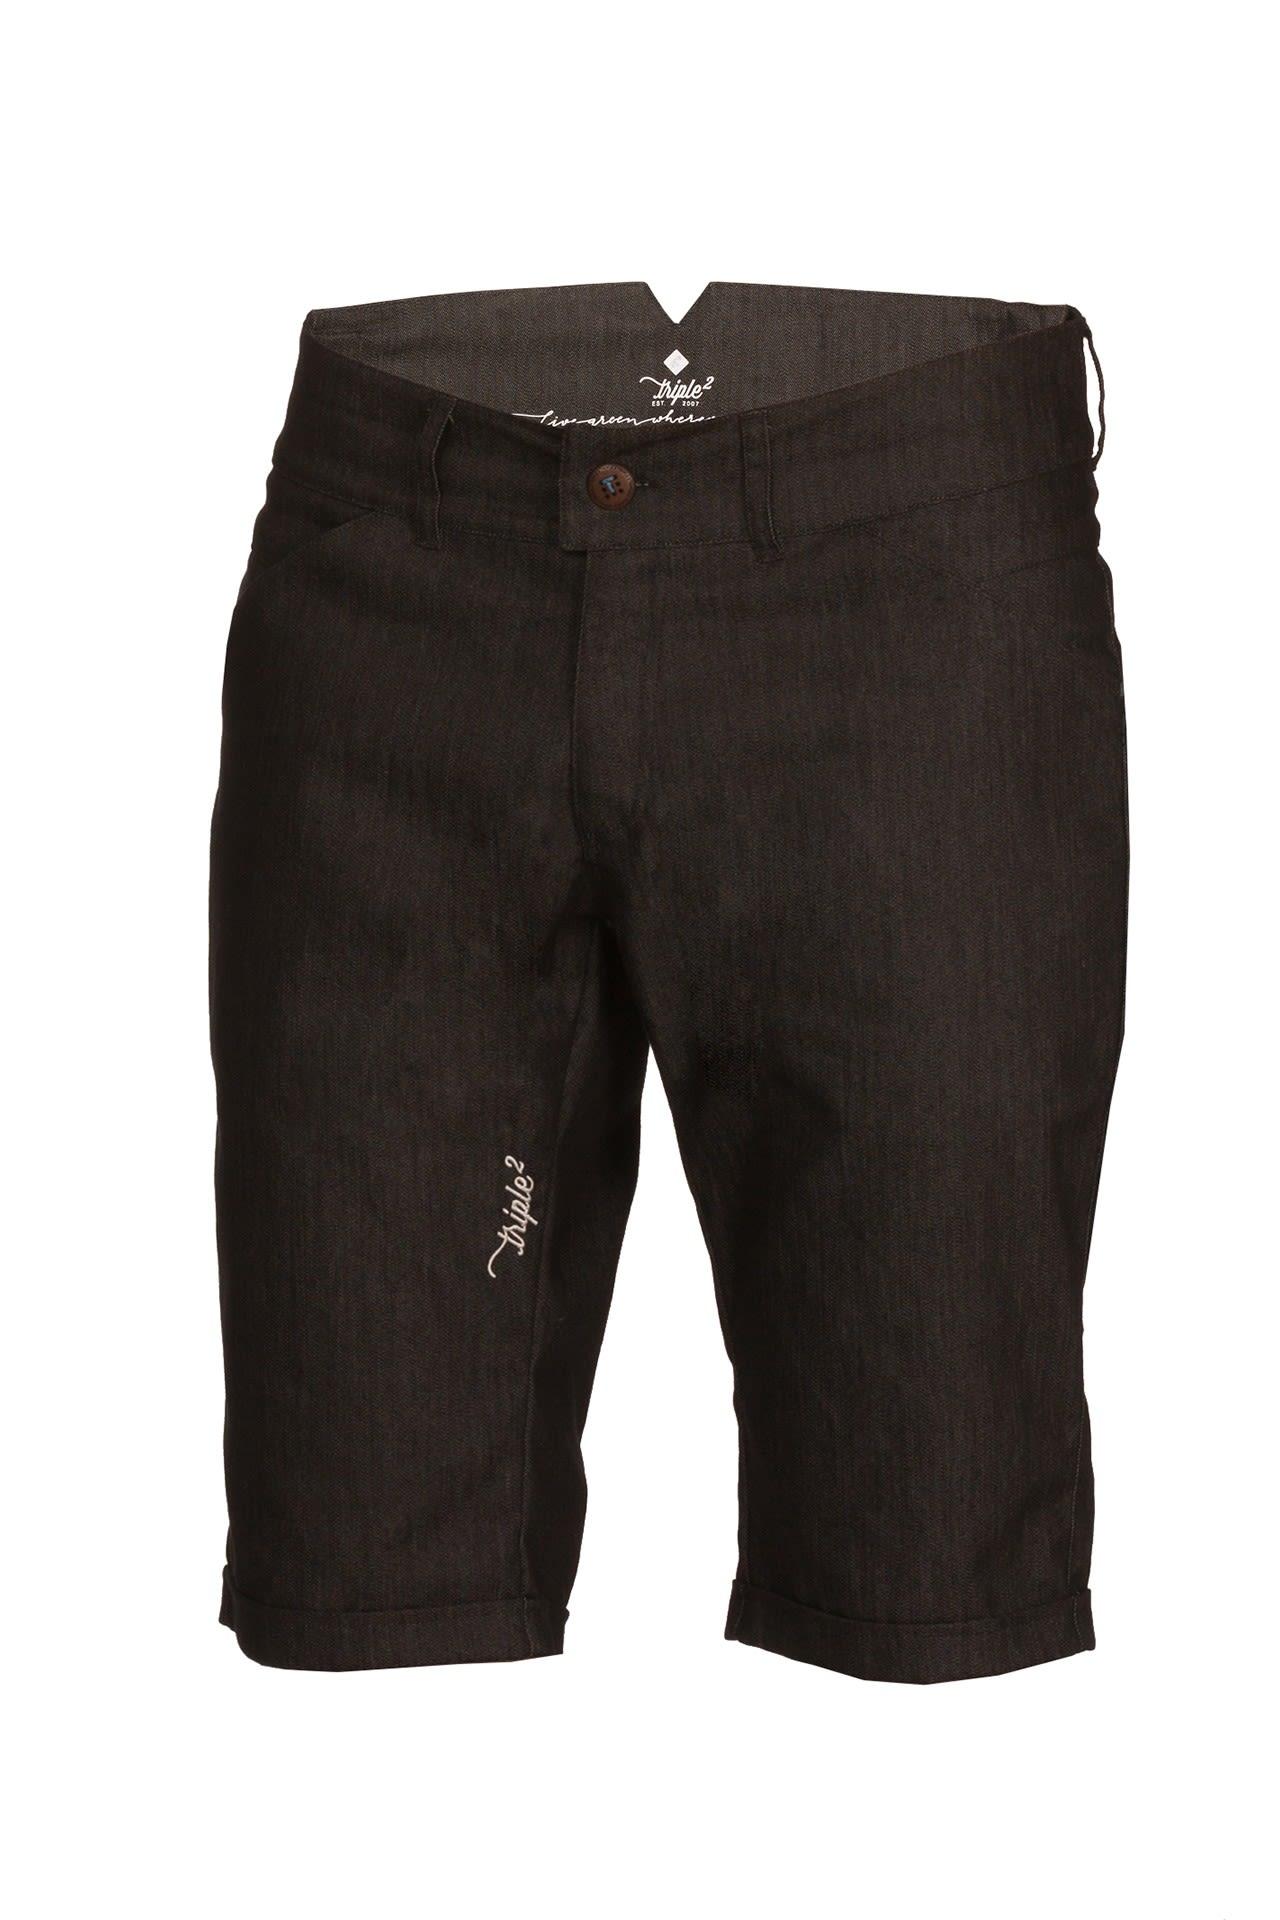 Triple2 Kort Cycling Denim Shorts Schwarz, Male Shorts, XL